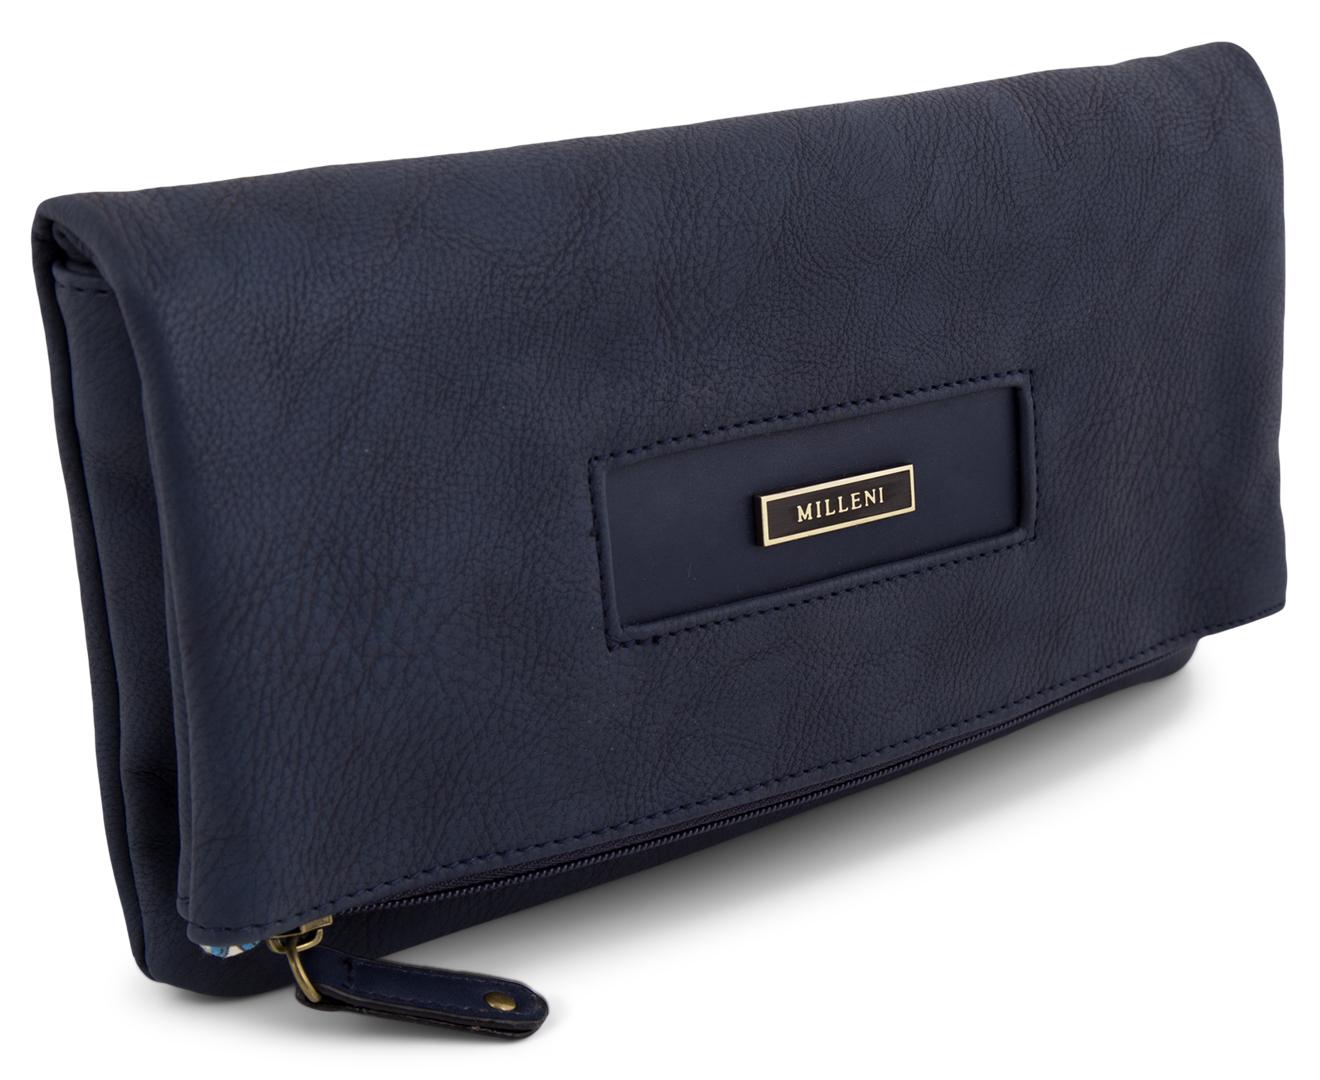 213baf514197 Milleni Foldable Crossbody Bag - Navy